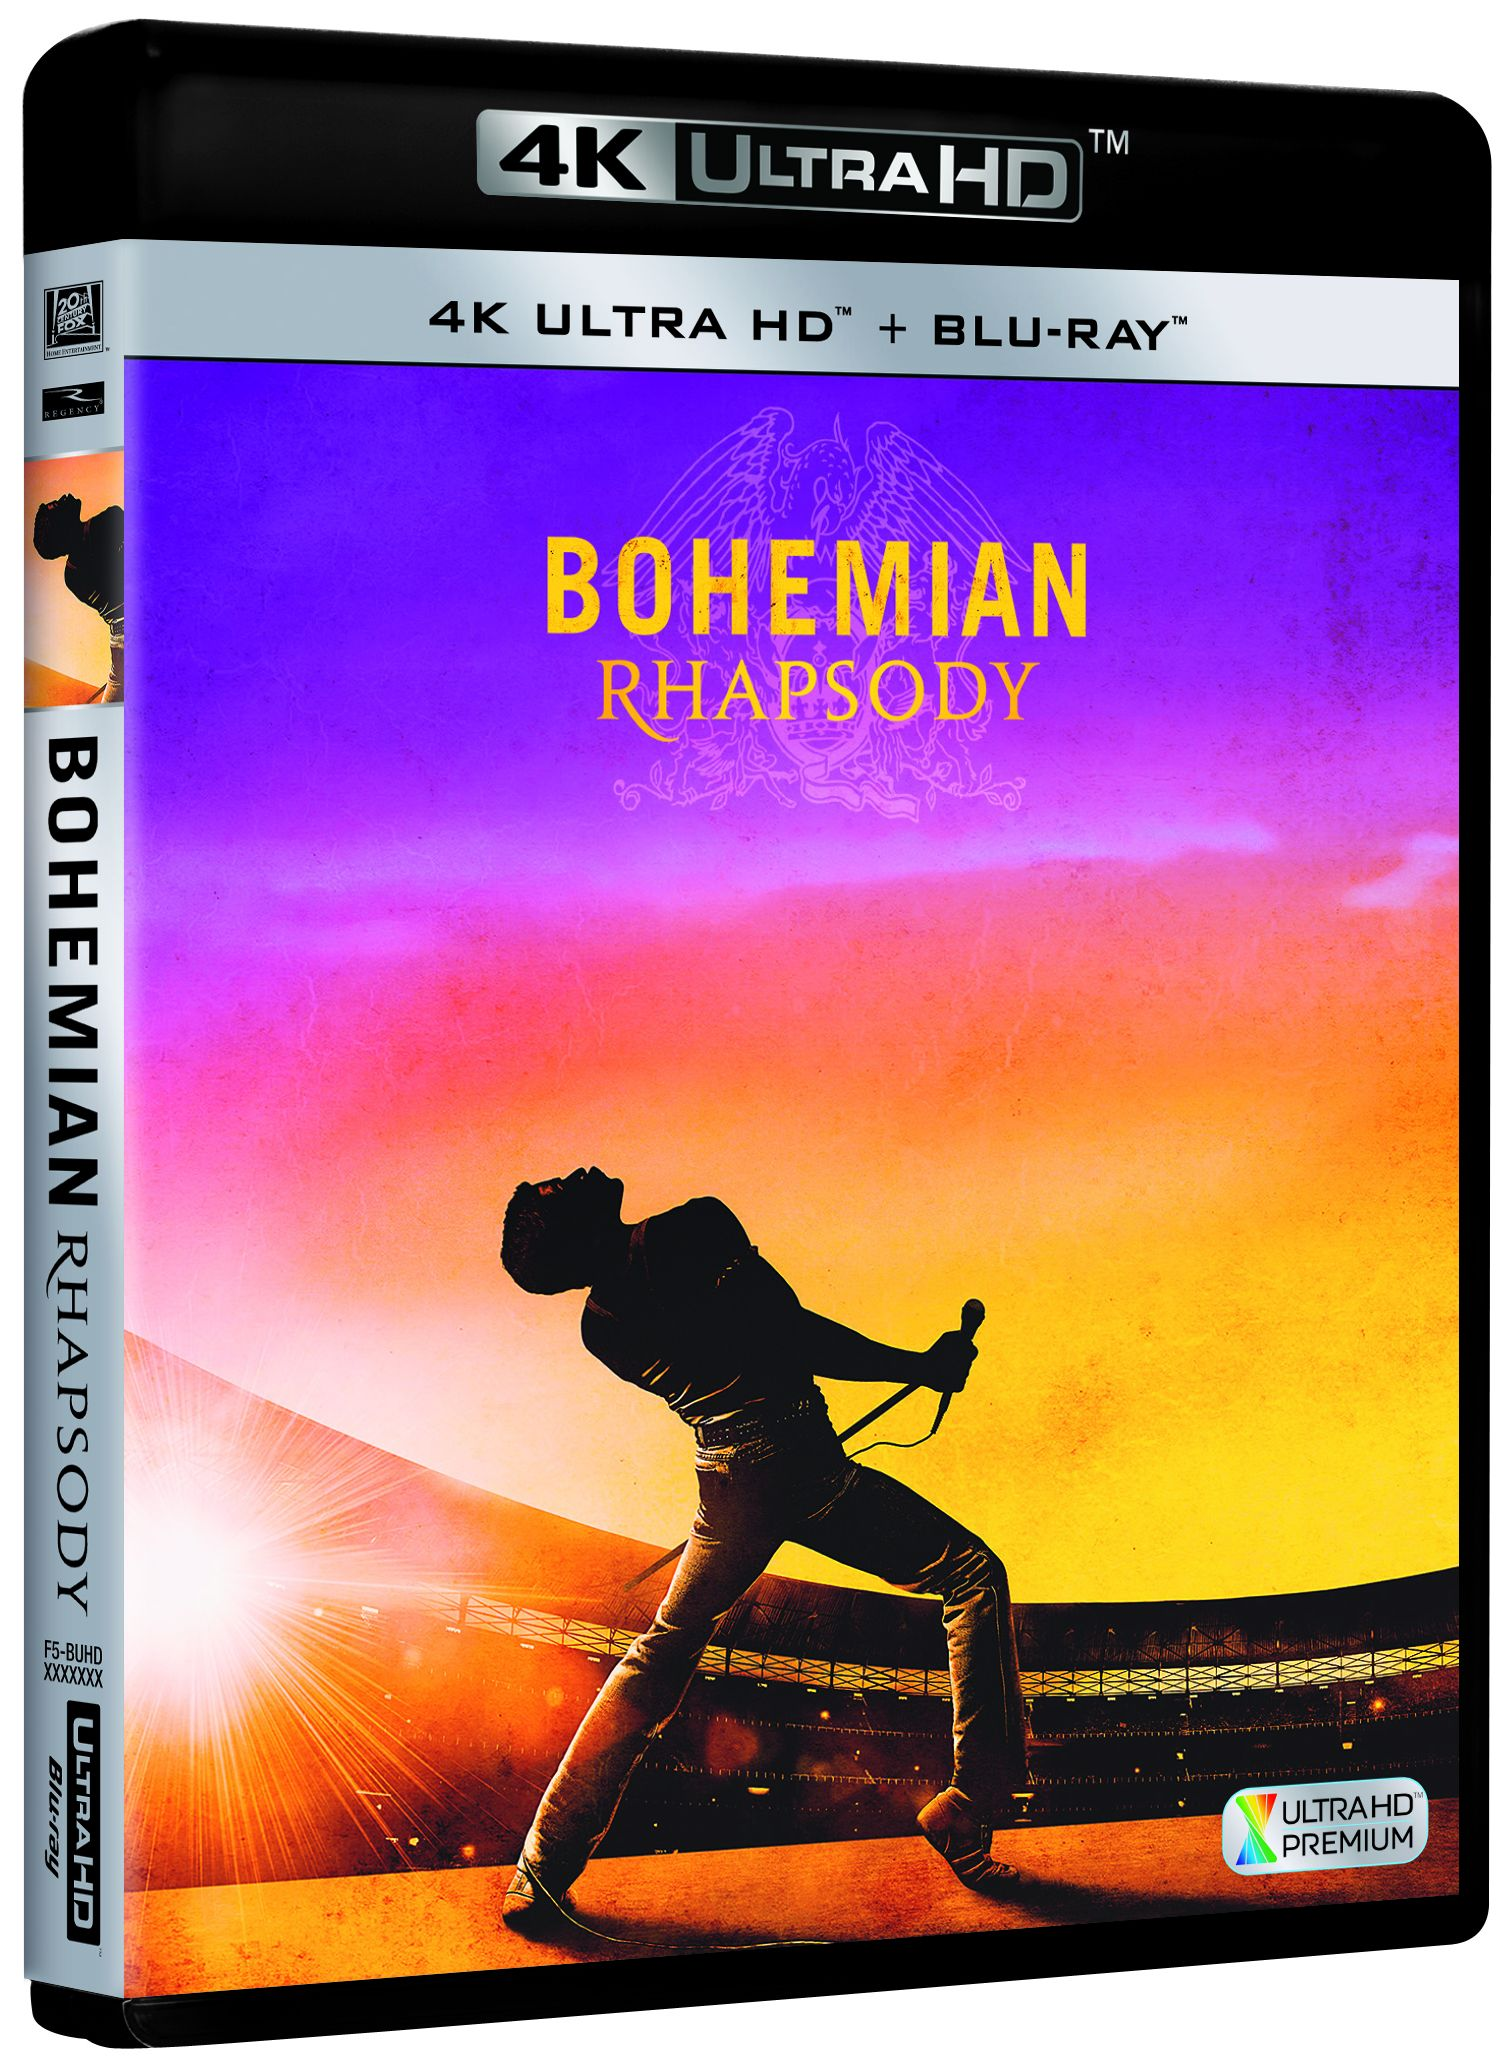 bohemian rhapsody - 4k uhd + blu ray --8420266022646